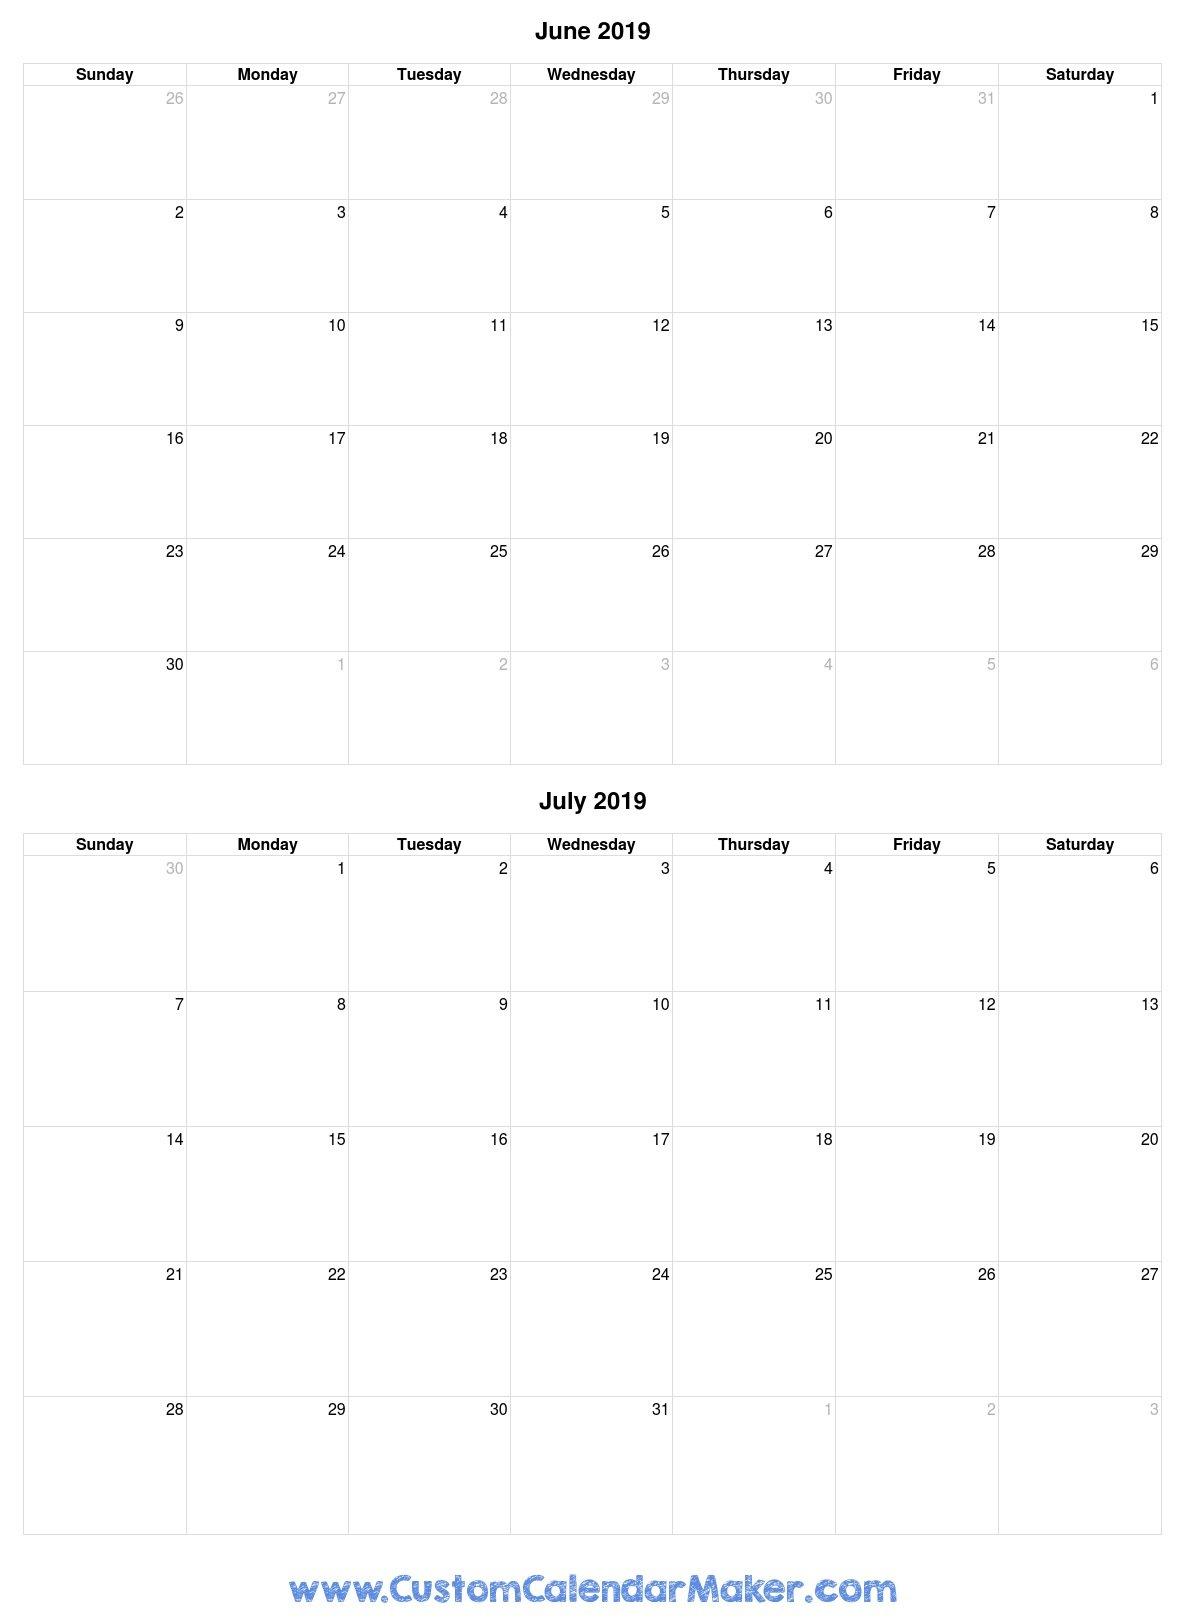 June And July 2019 Free Printable Calendar Template Calendar 2019 June July